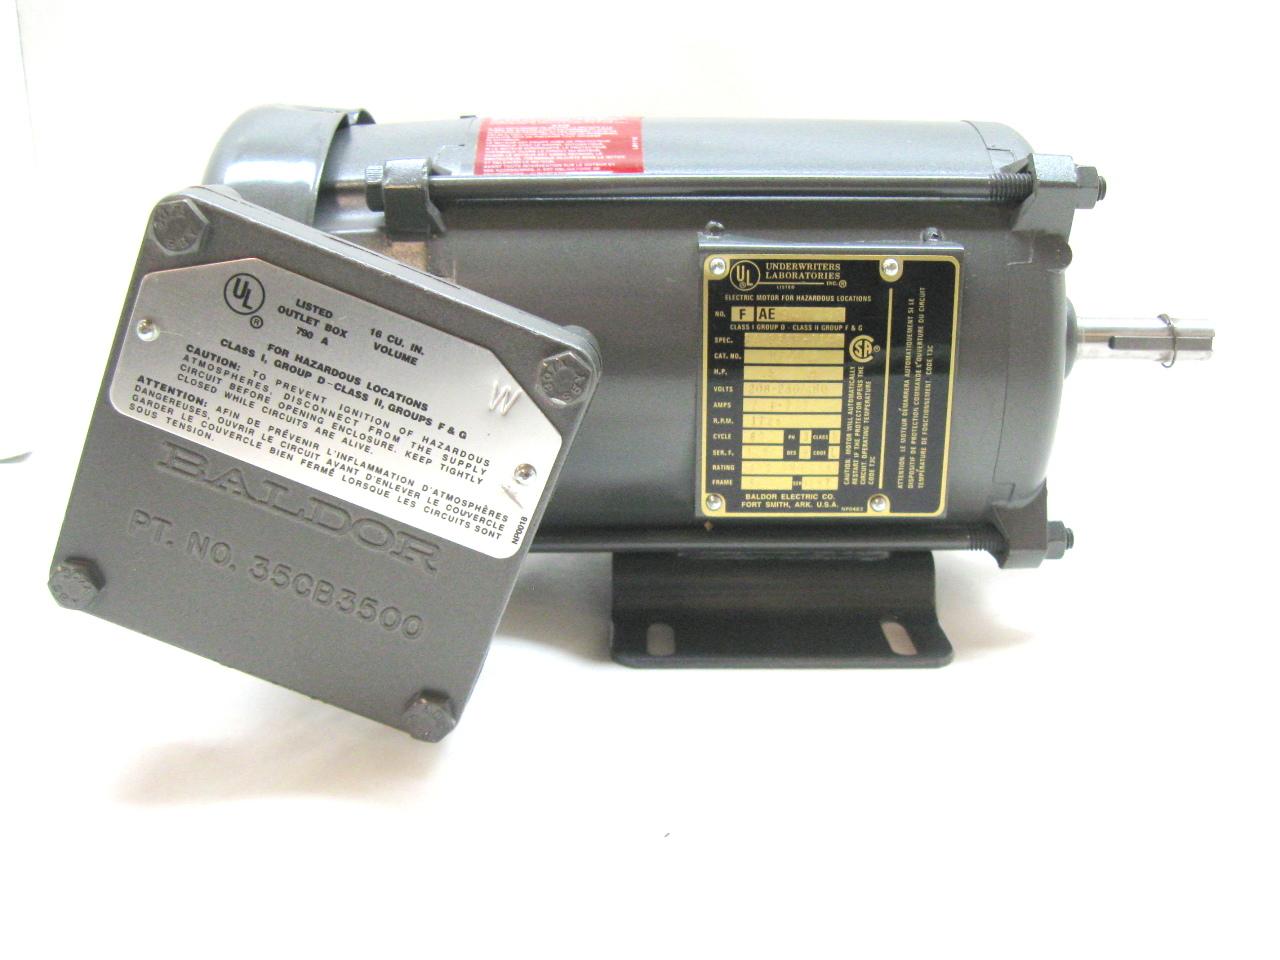 Baldor m7006a motor 5 hp 208 230 460 v 1725 rpm 3 phase for Baldor 2 hp single phase motor